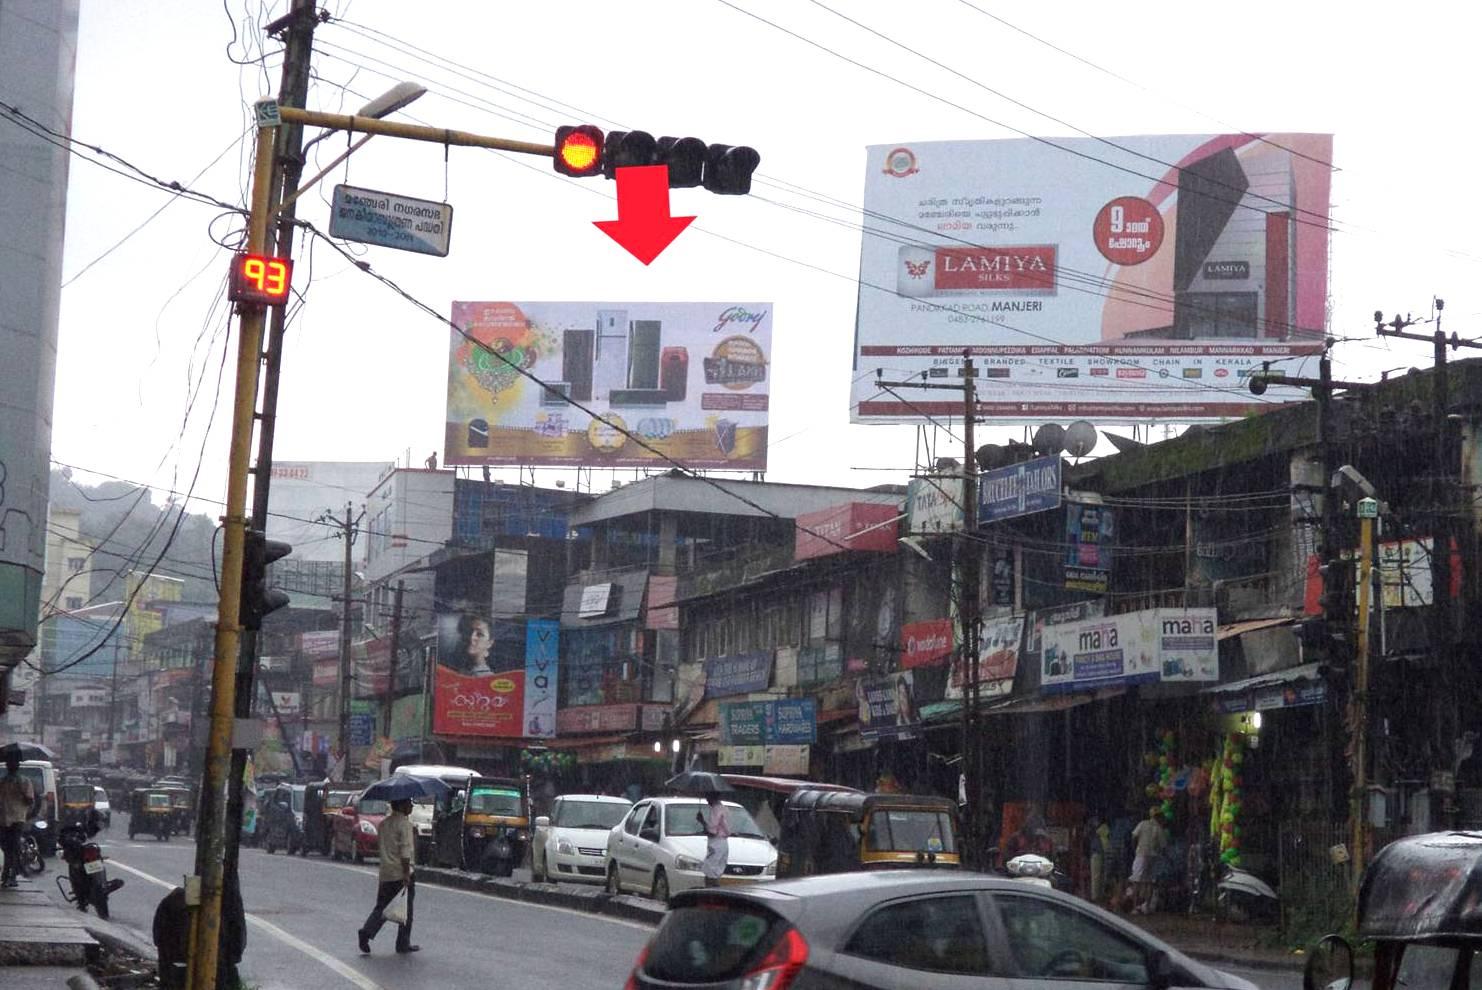 Billboards Ads In Manjery Hilltop